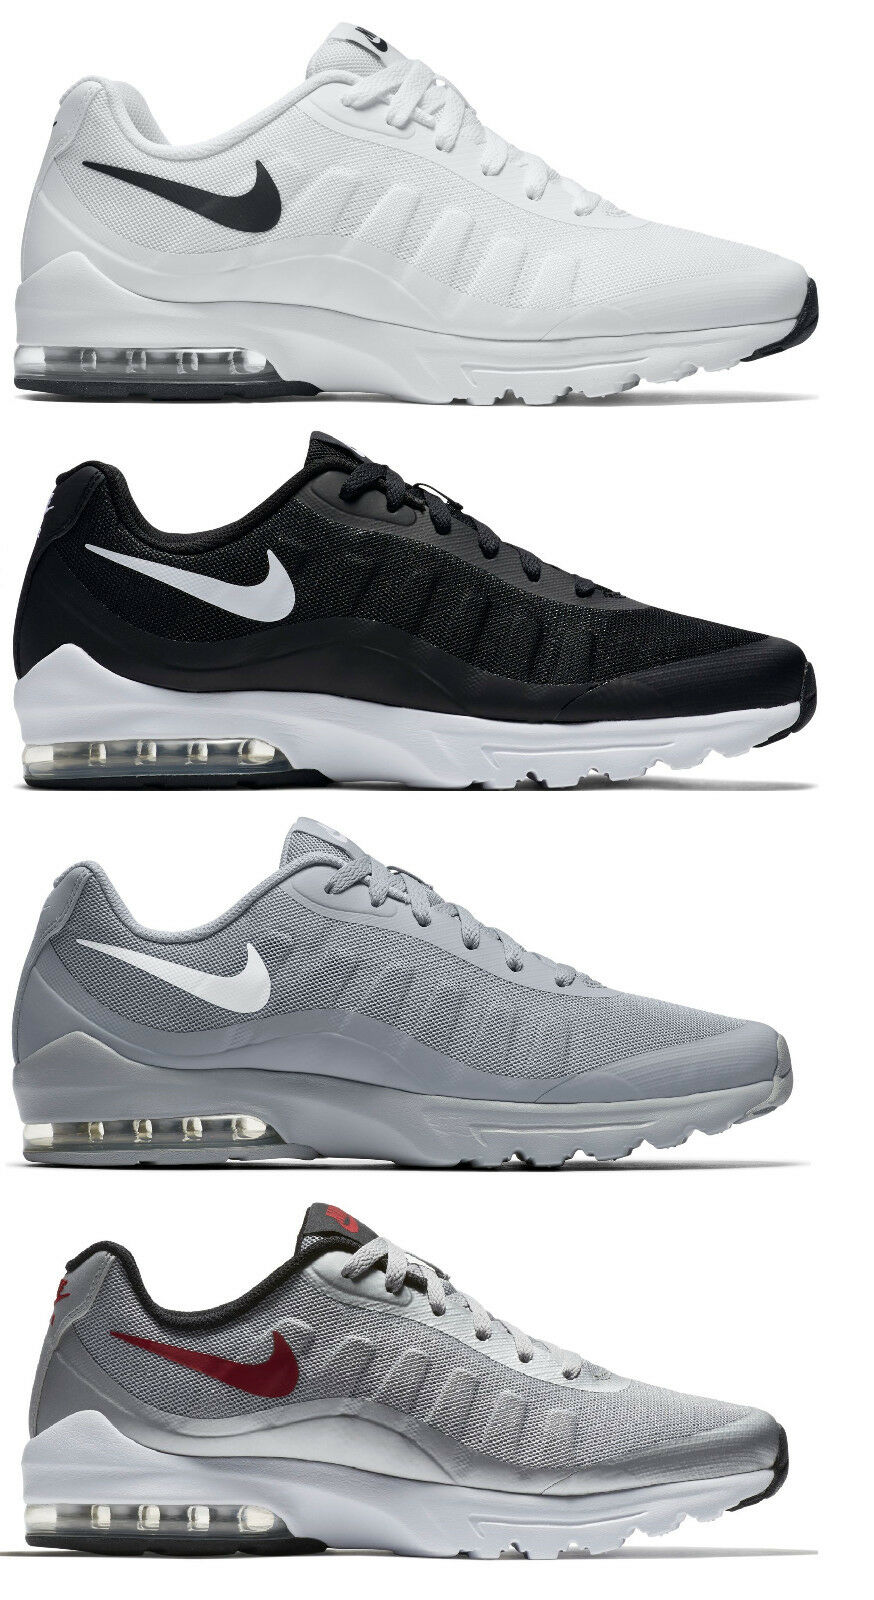 newest 2d506 e9bd3 Nike Air Max INVIGOR, Sneaker, LTD, Classic, Sportschuhe, Turnschuh, 749680